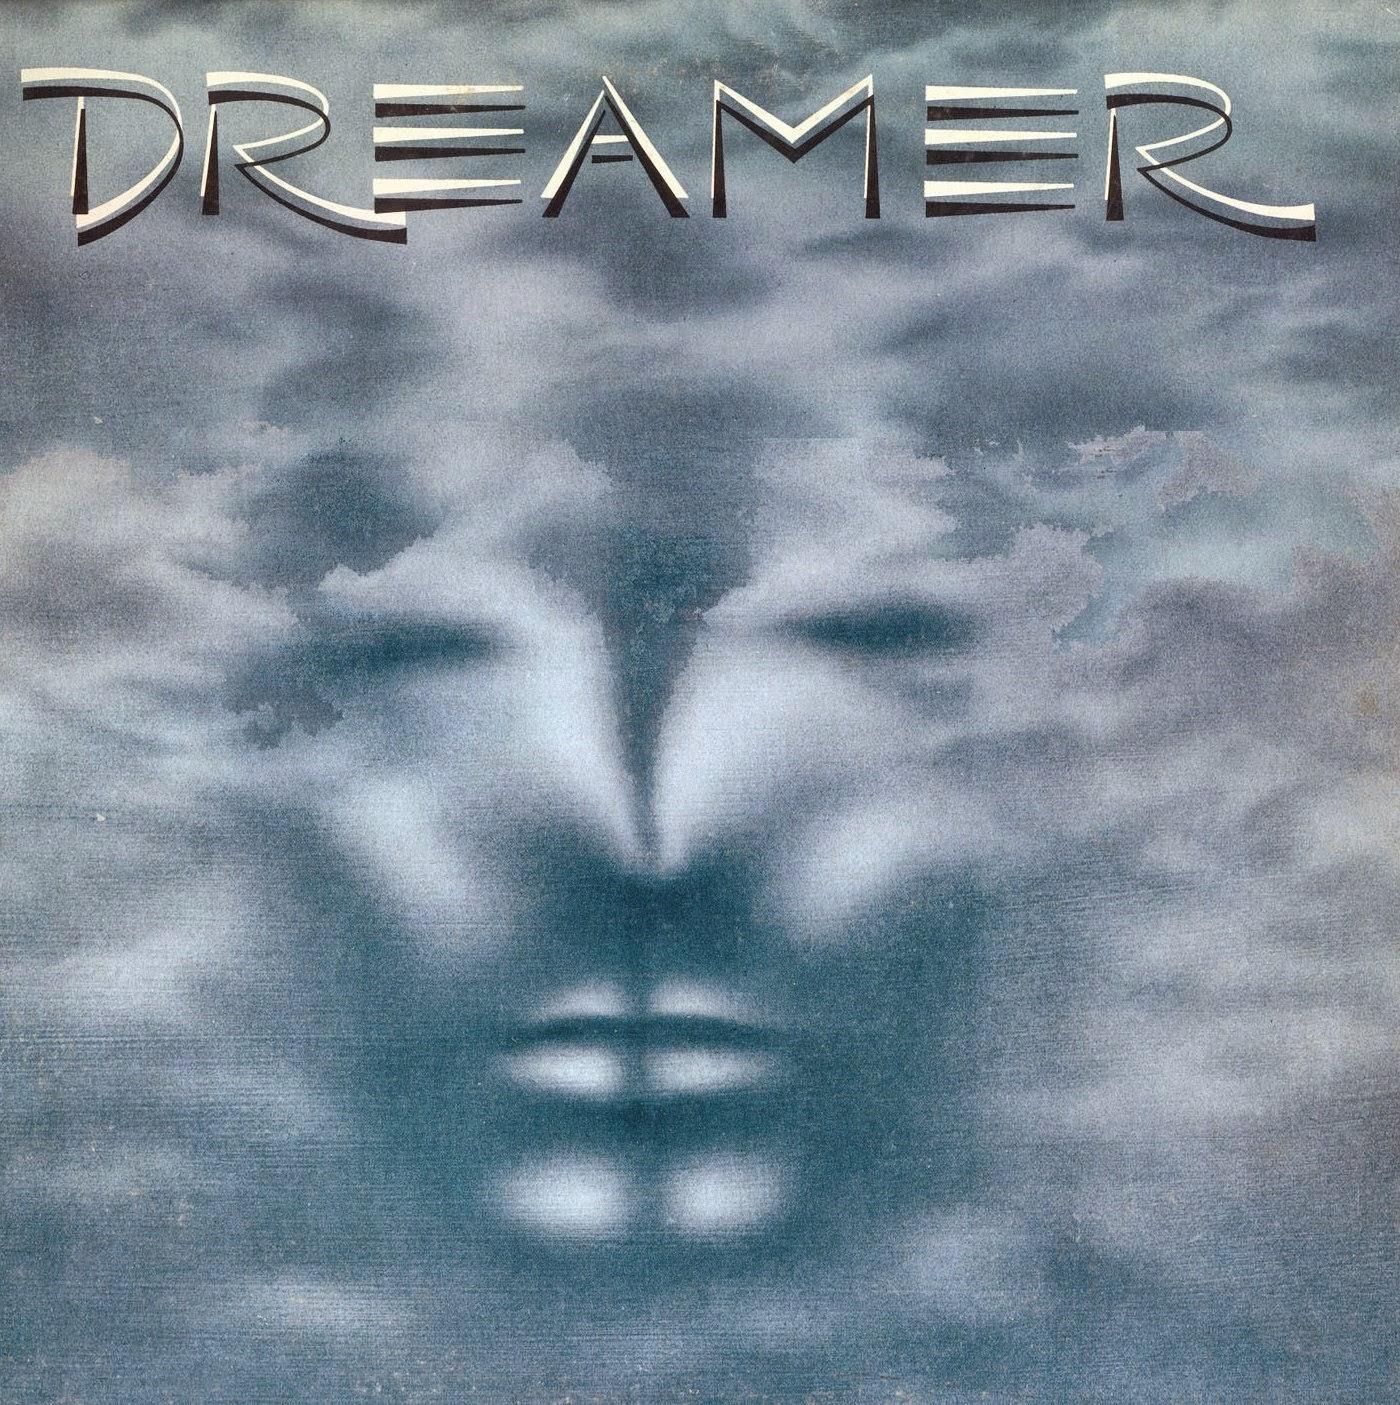 Dreamer st 1982 aor melodic rock